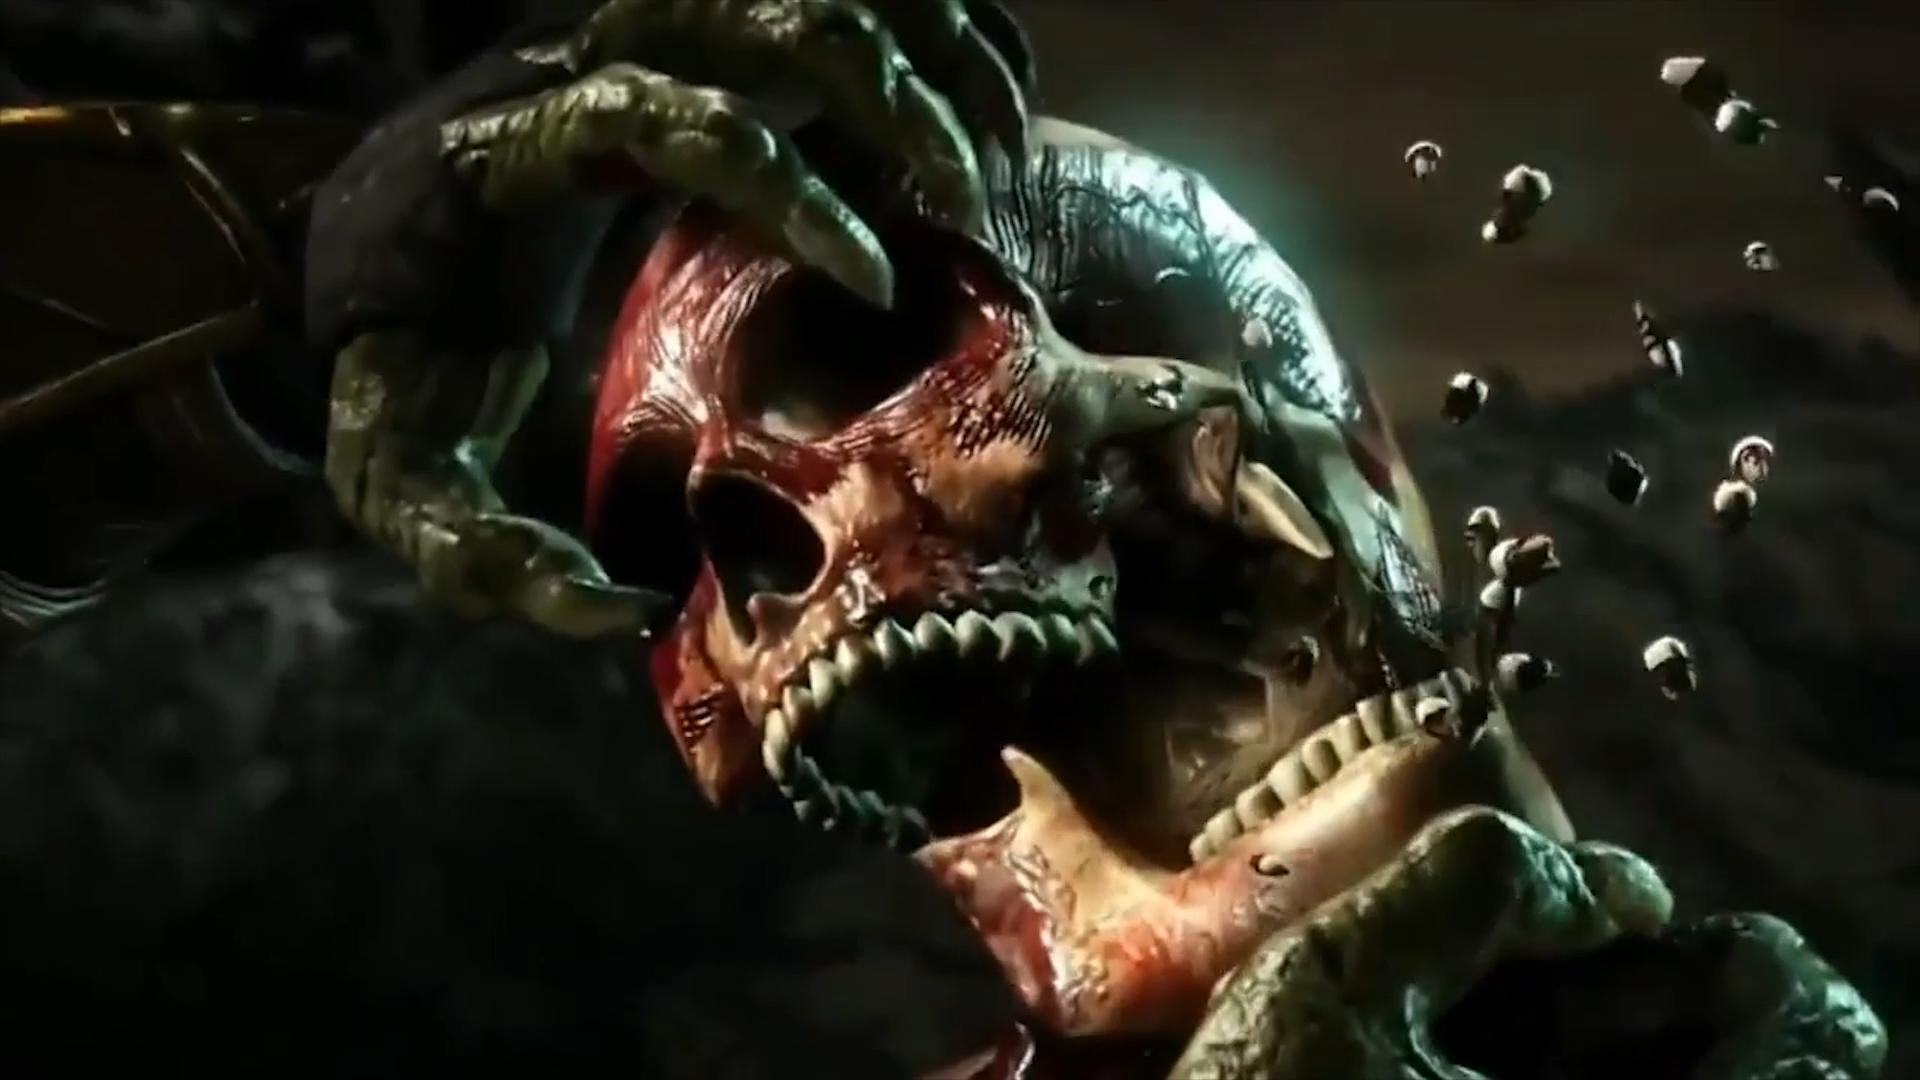 X-Rayها در Mortal Kombat X